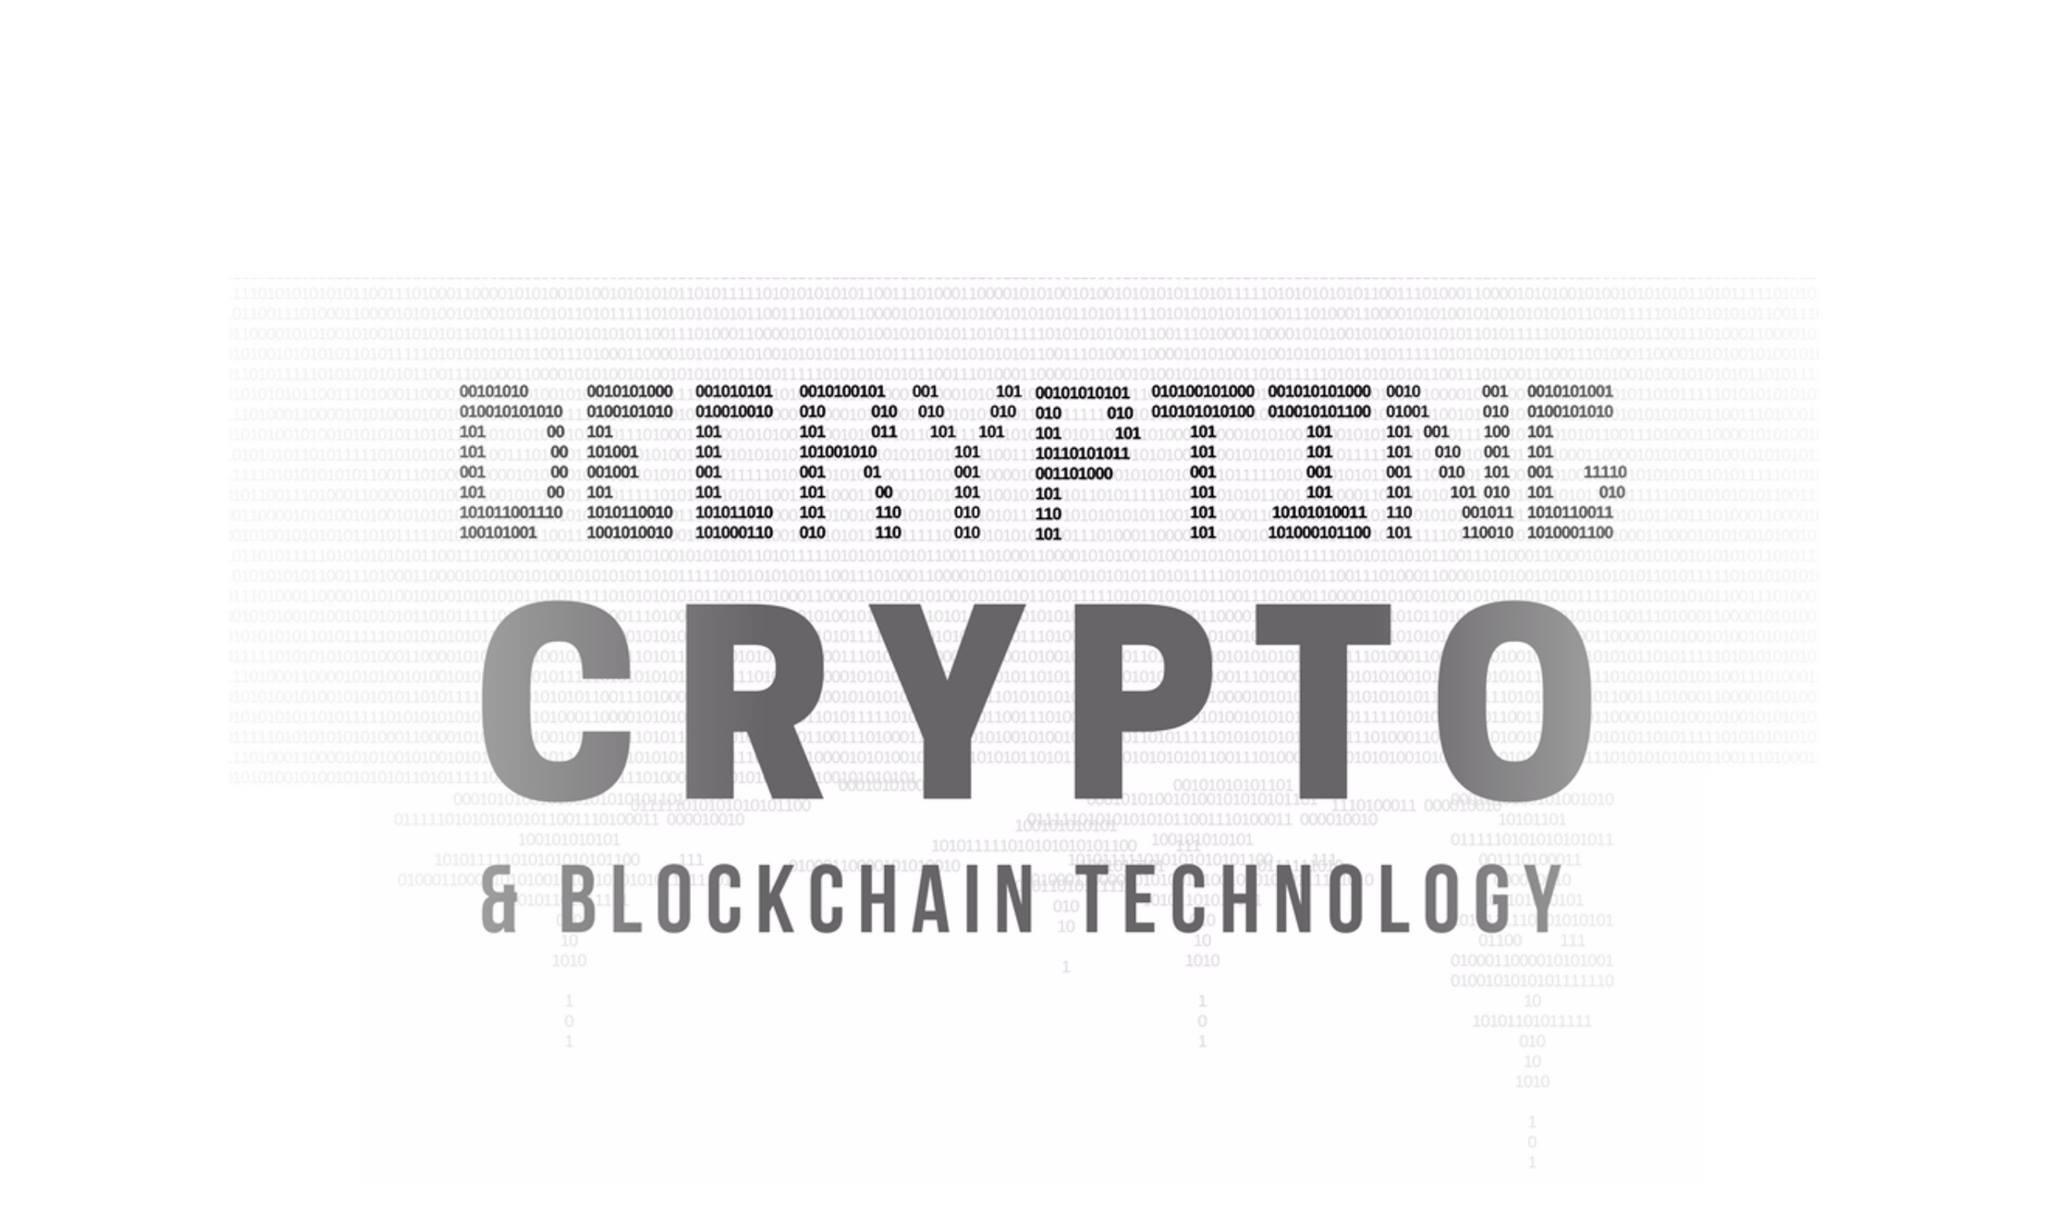 Event Calendar Crypto : Decrypting crypto blockchain technology wednesday